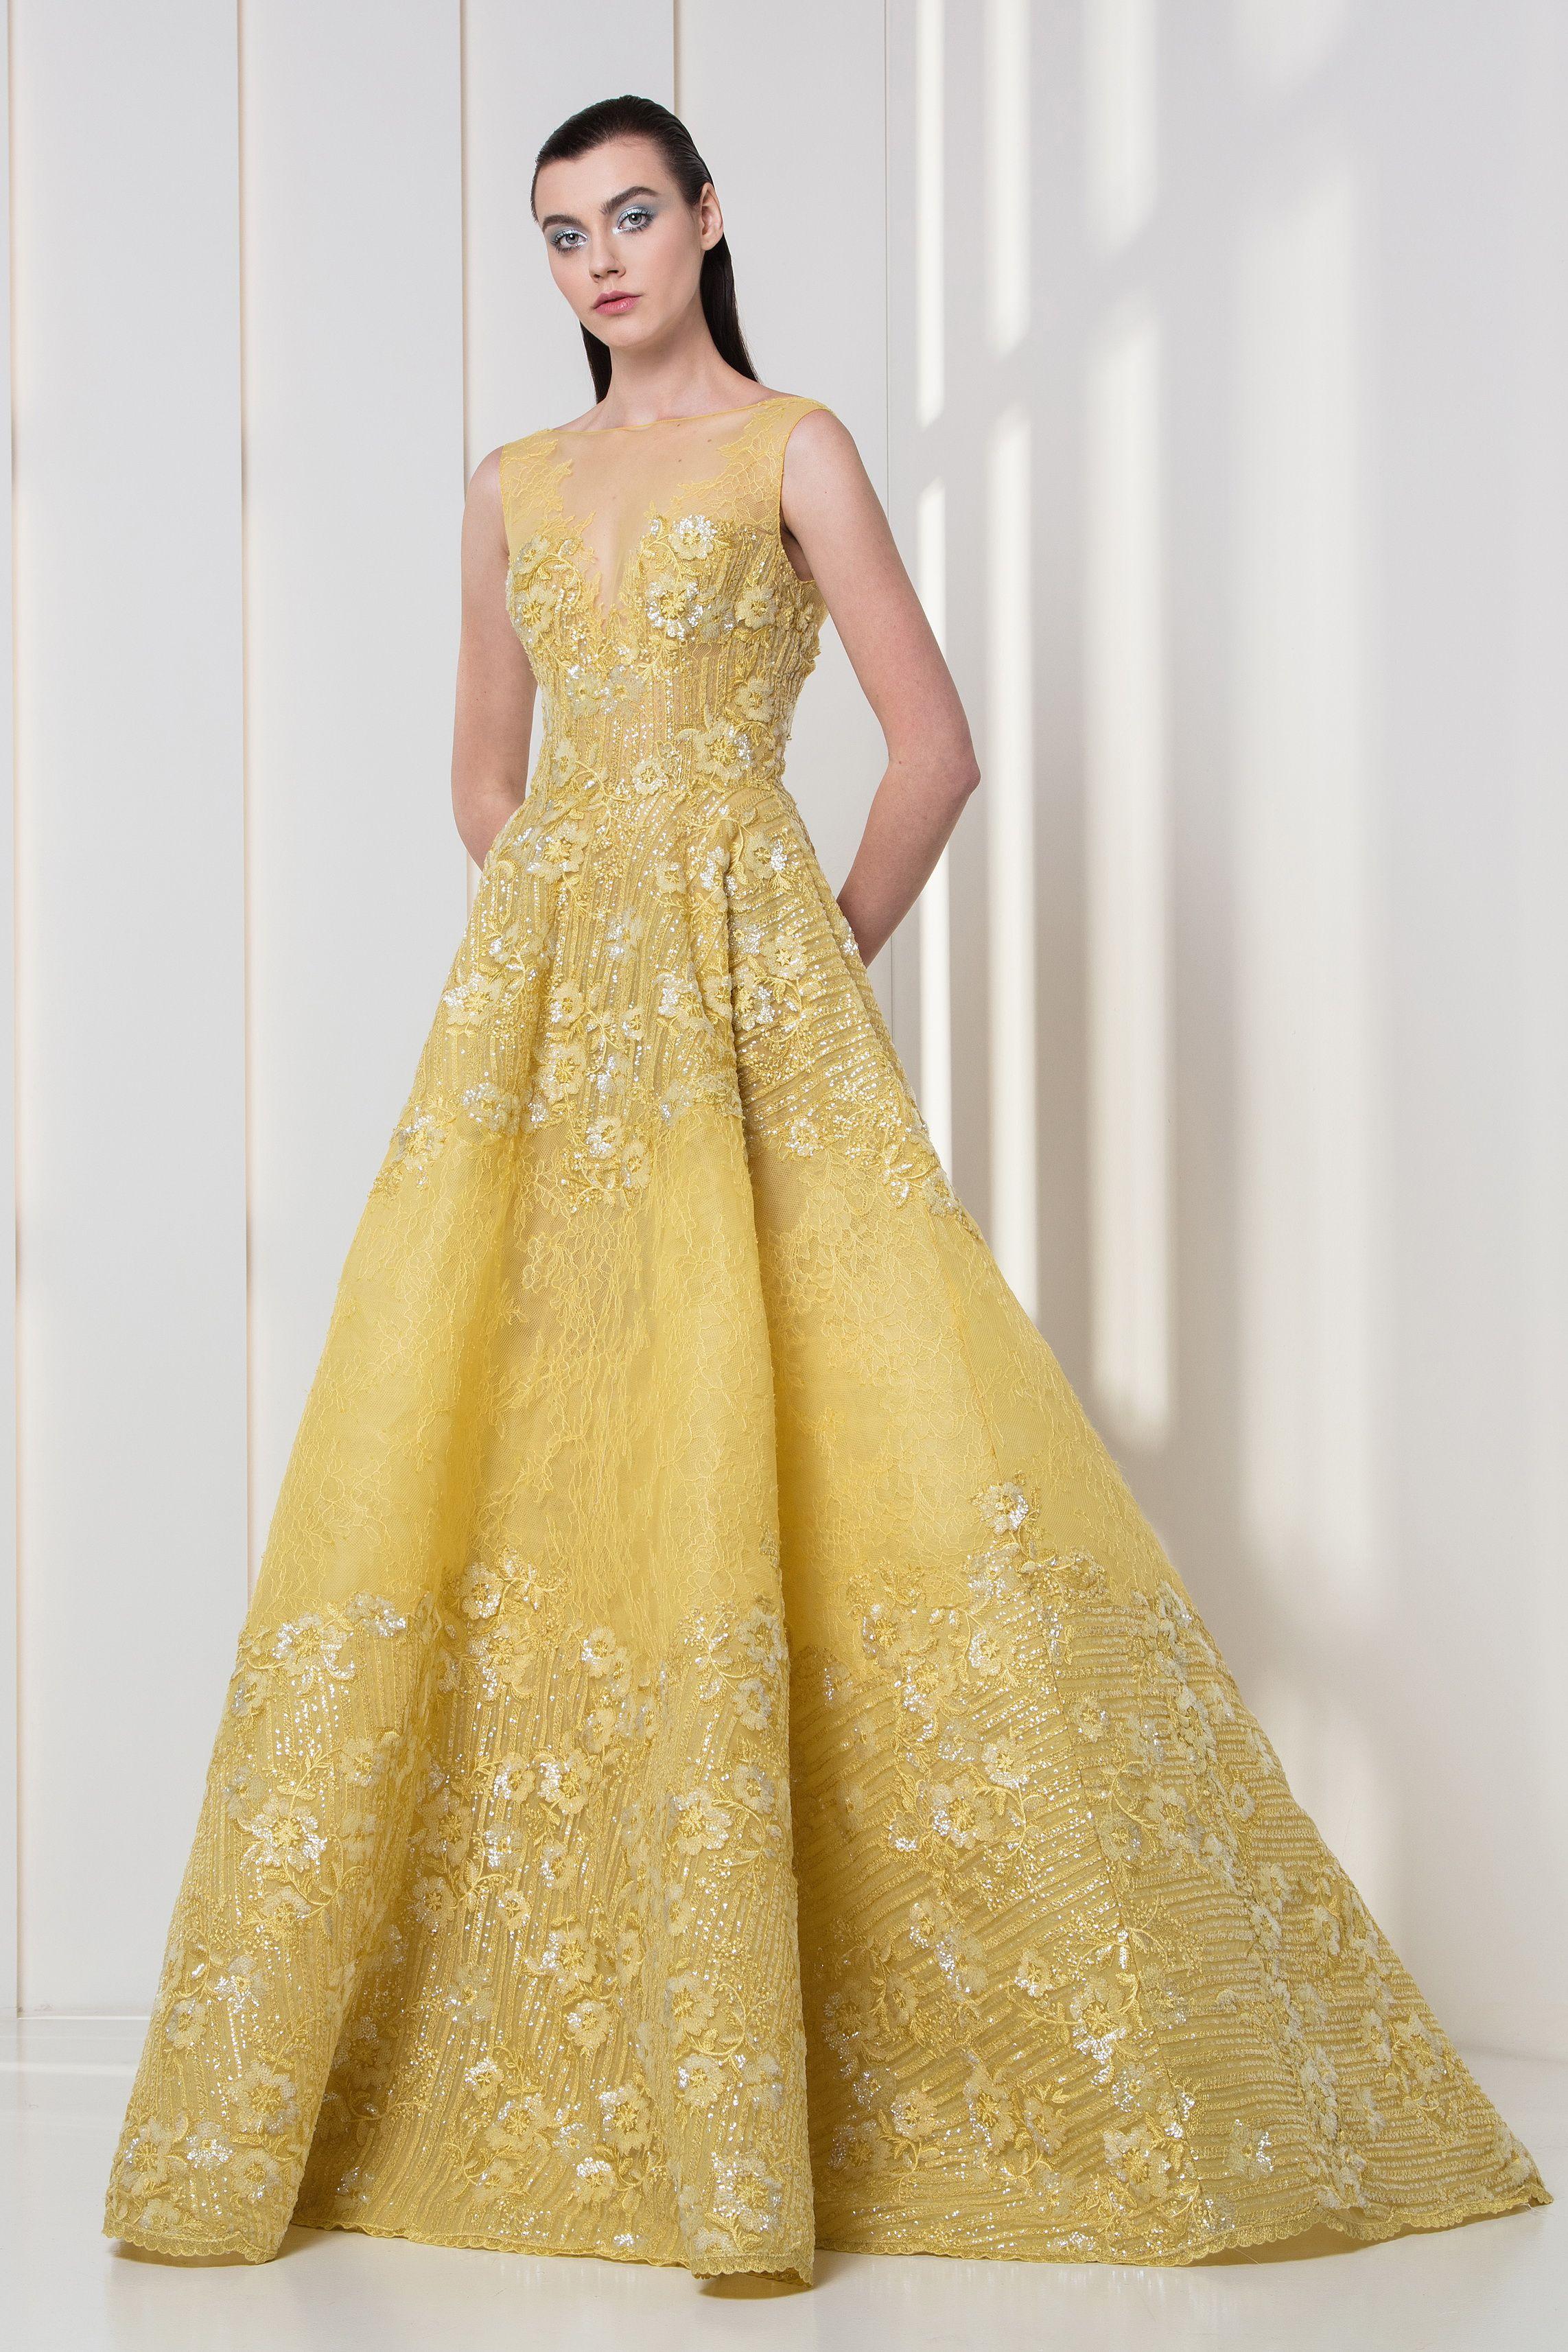 Tony Ward Rtw Fw 17 18 I Style 30 Yellow A Line Dress